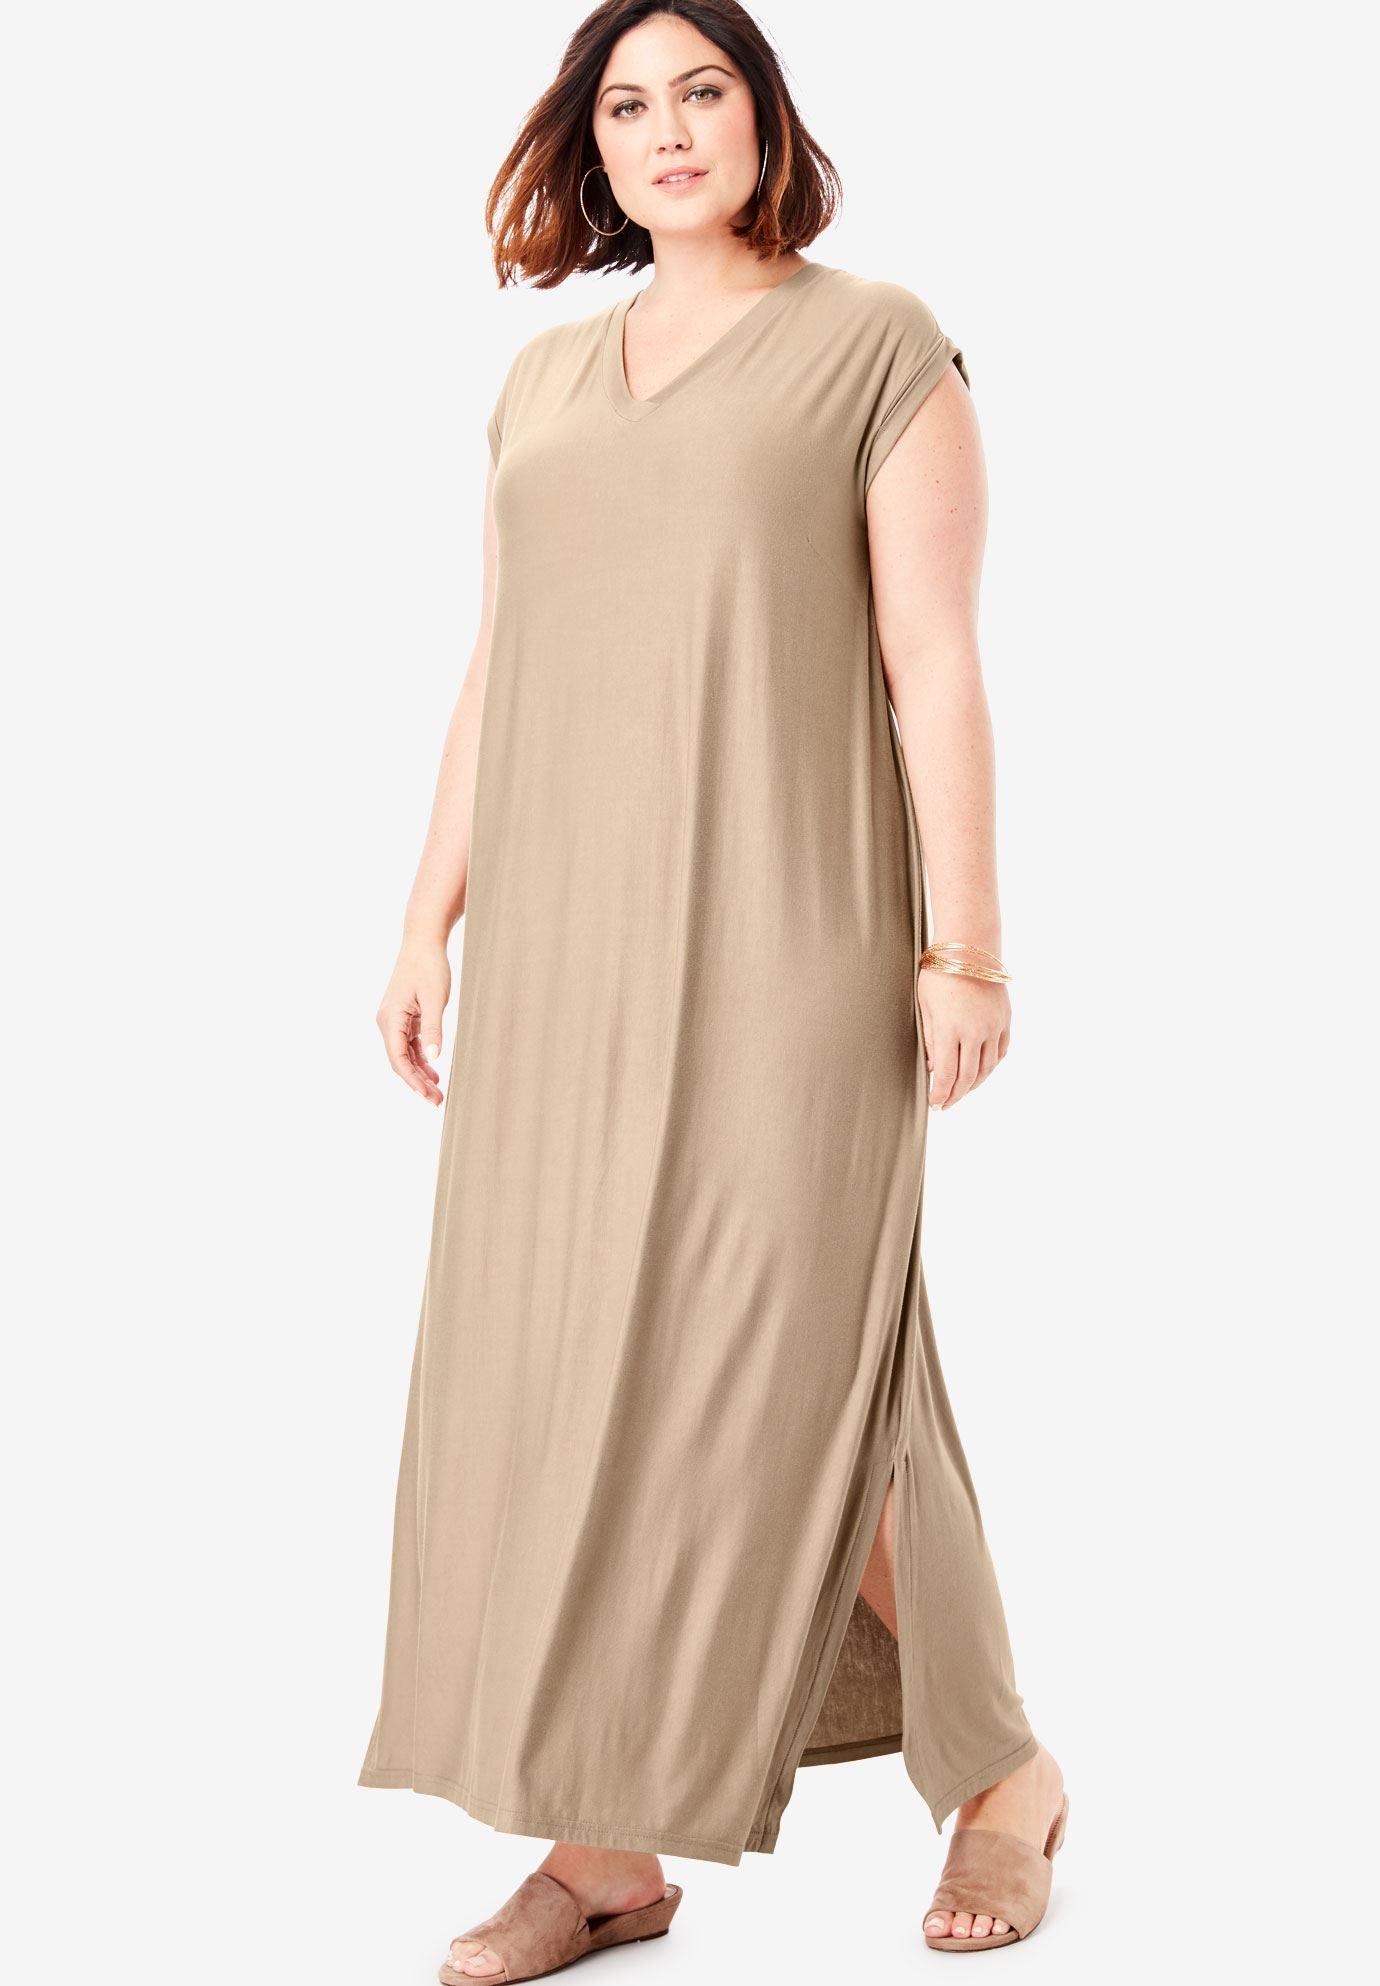 Side-Slit T-Shirt Dress | Plus Size Casual Dresses ...